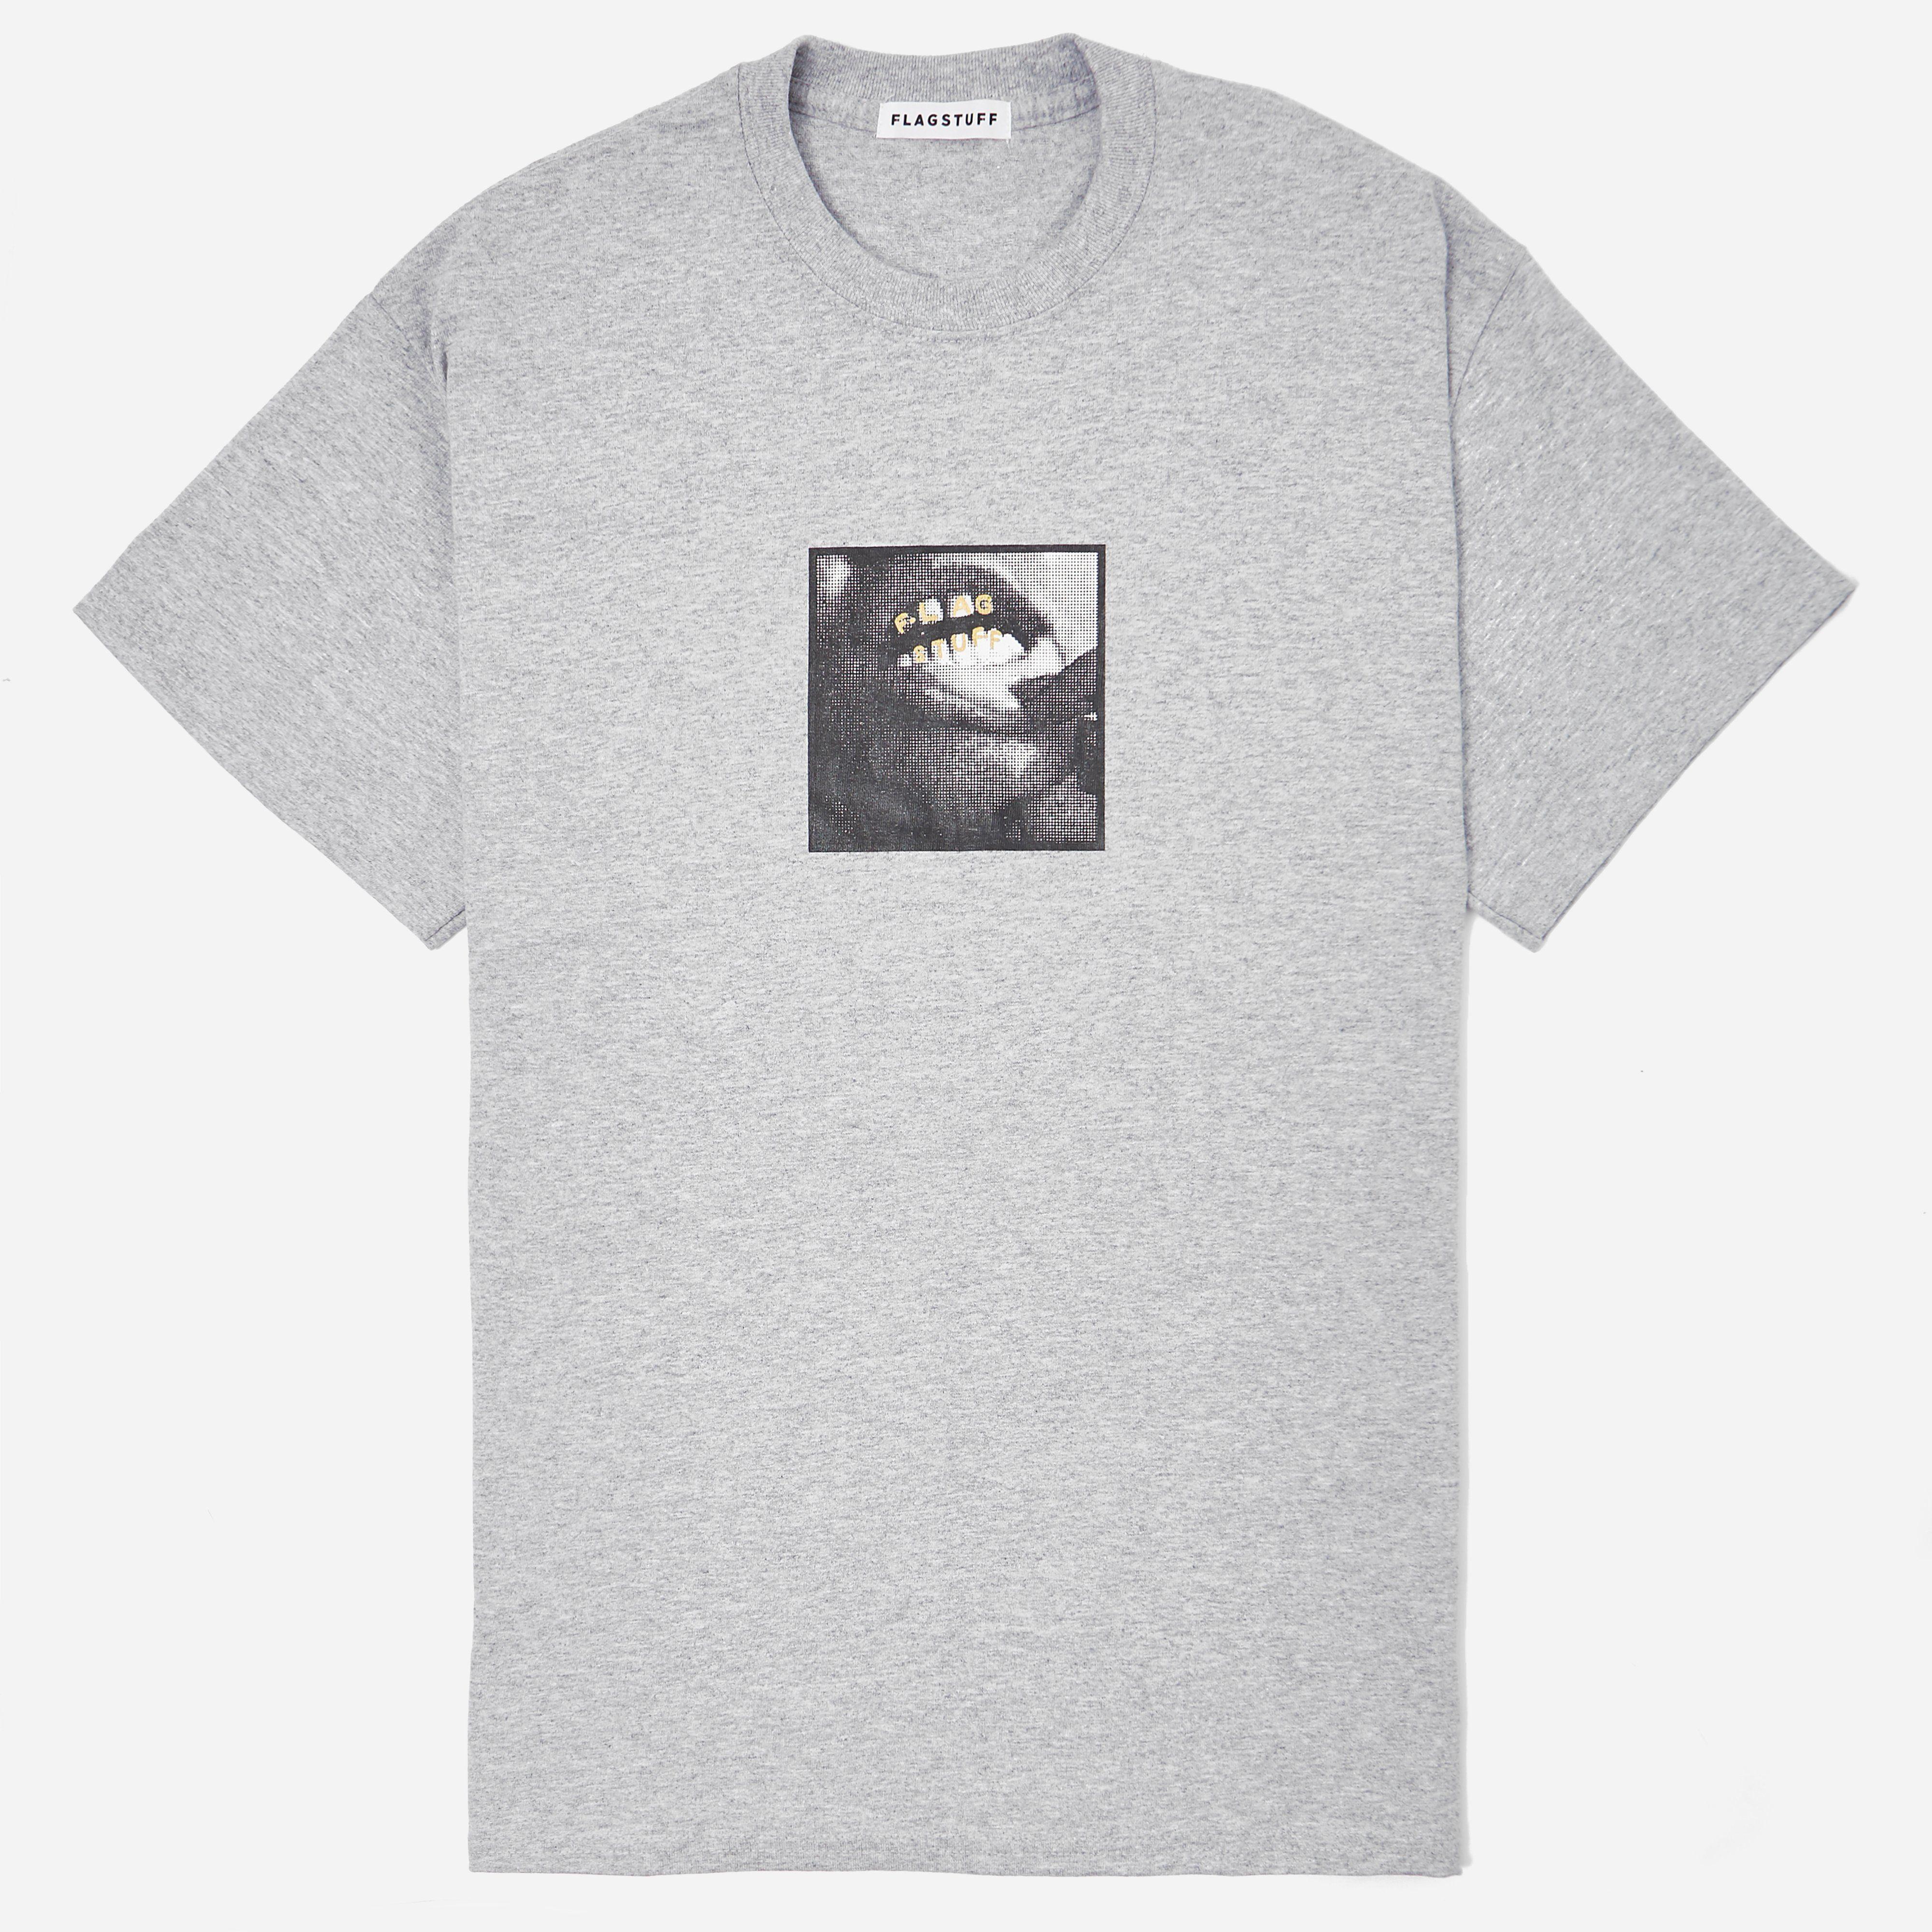 Flagstuff Grills T-shirt